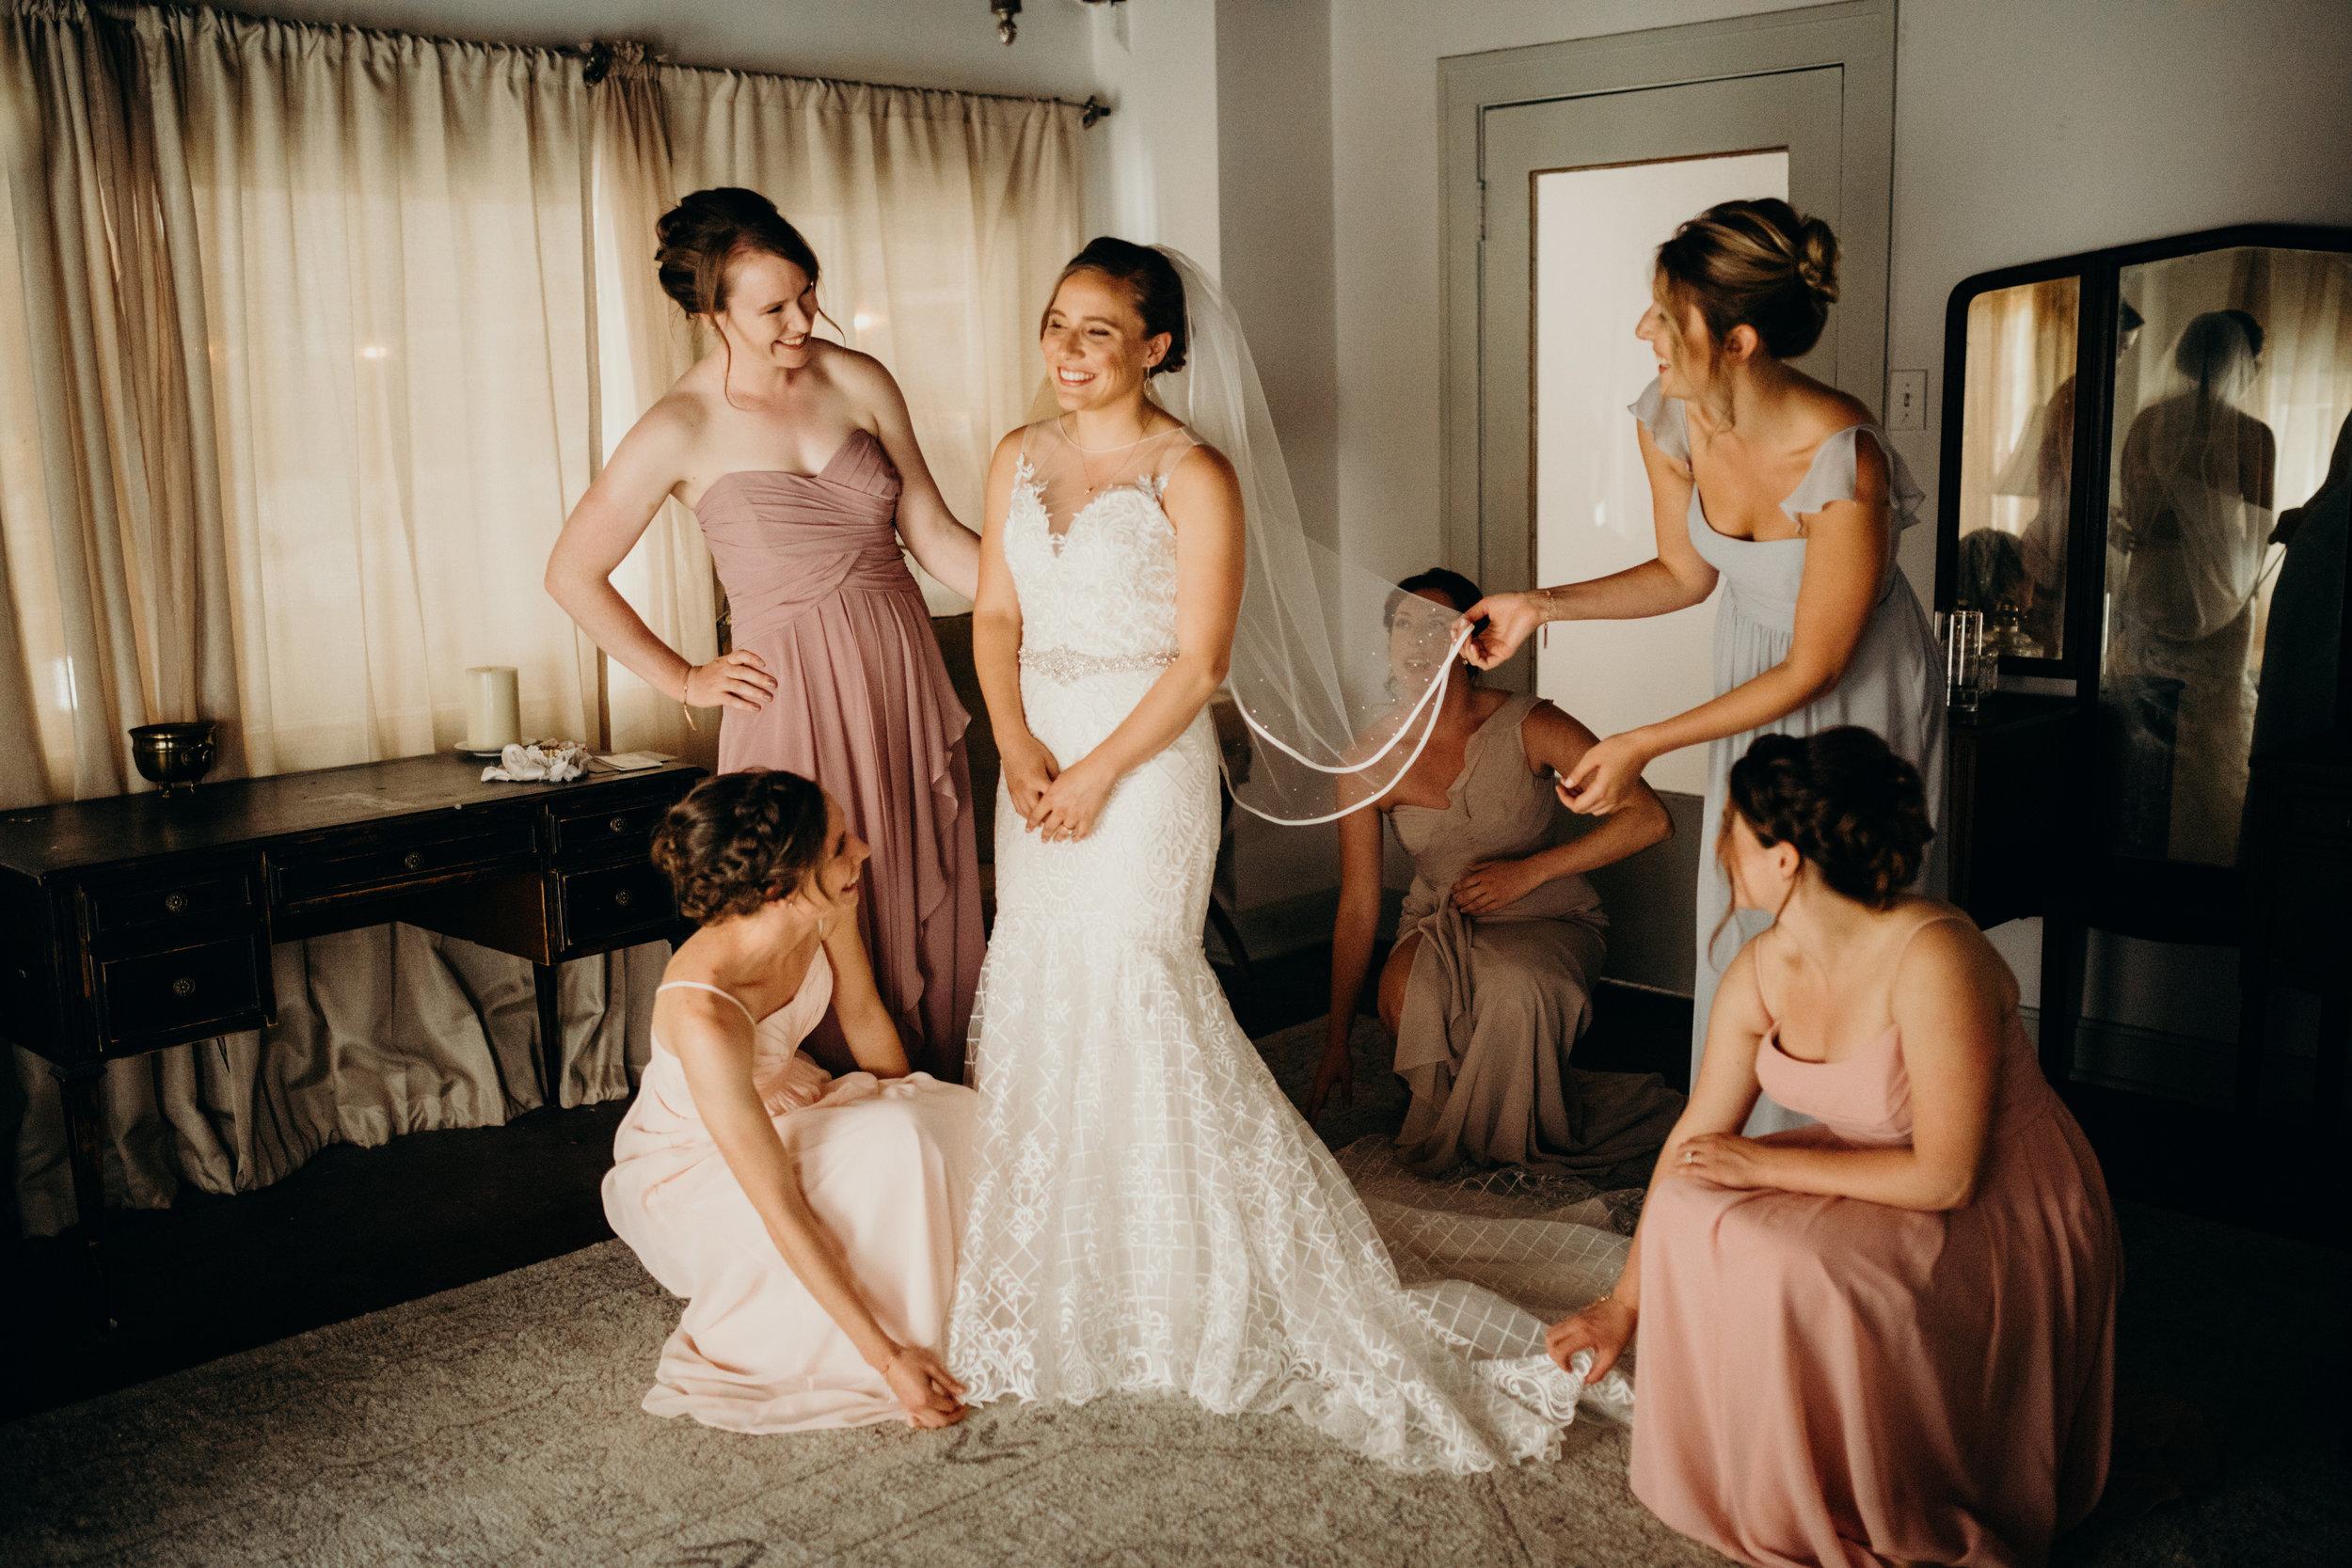 Vintage Wedding_Polly C Photography_20171726152023.jpg